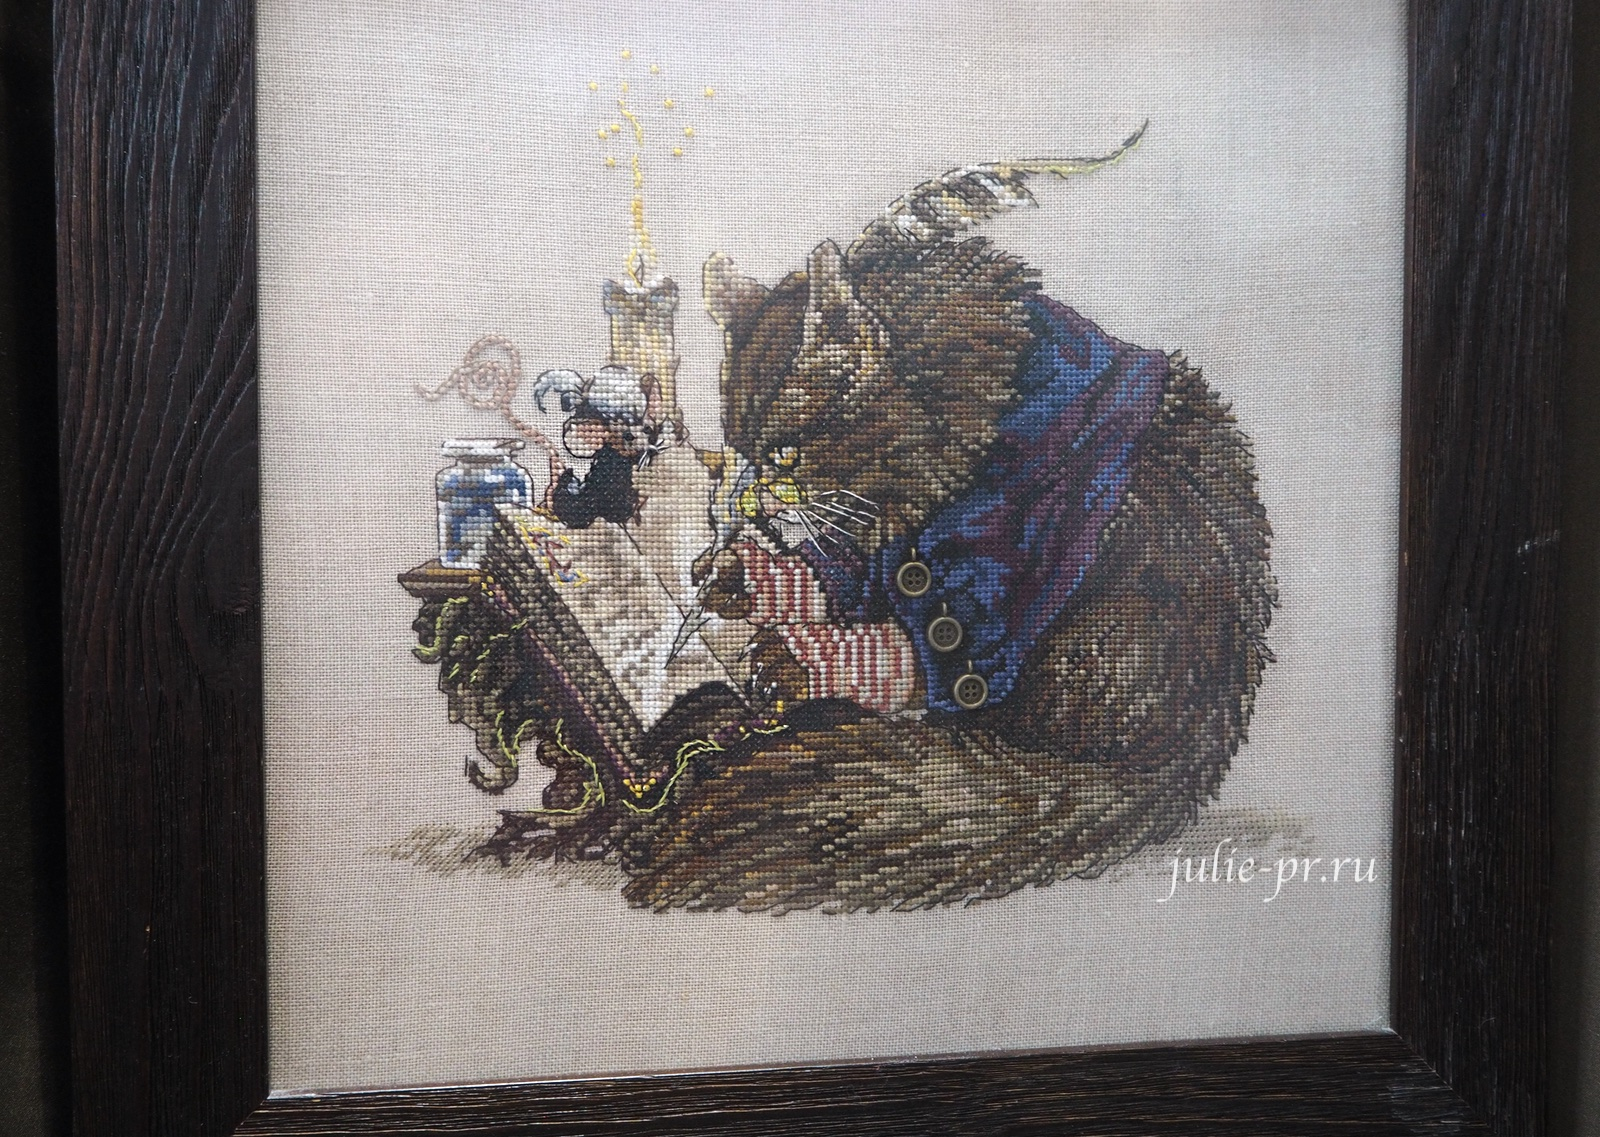 Nimue, Challigraphe, Кот каллиграф, вышивка крестом